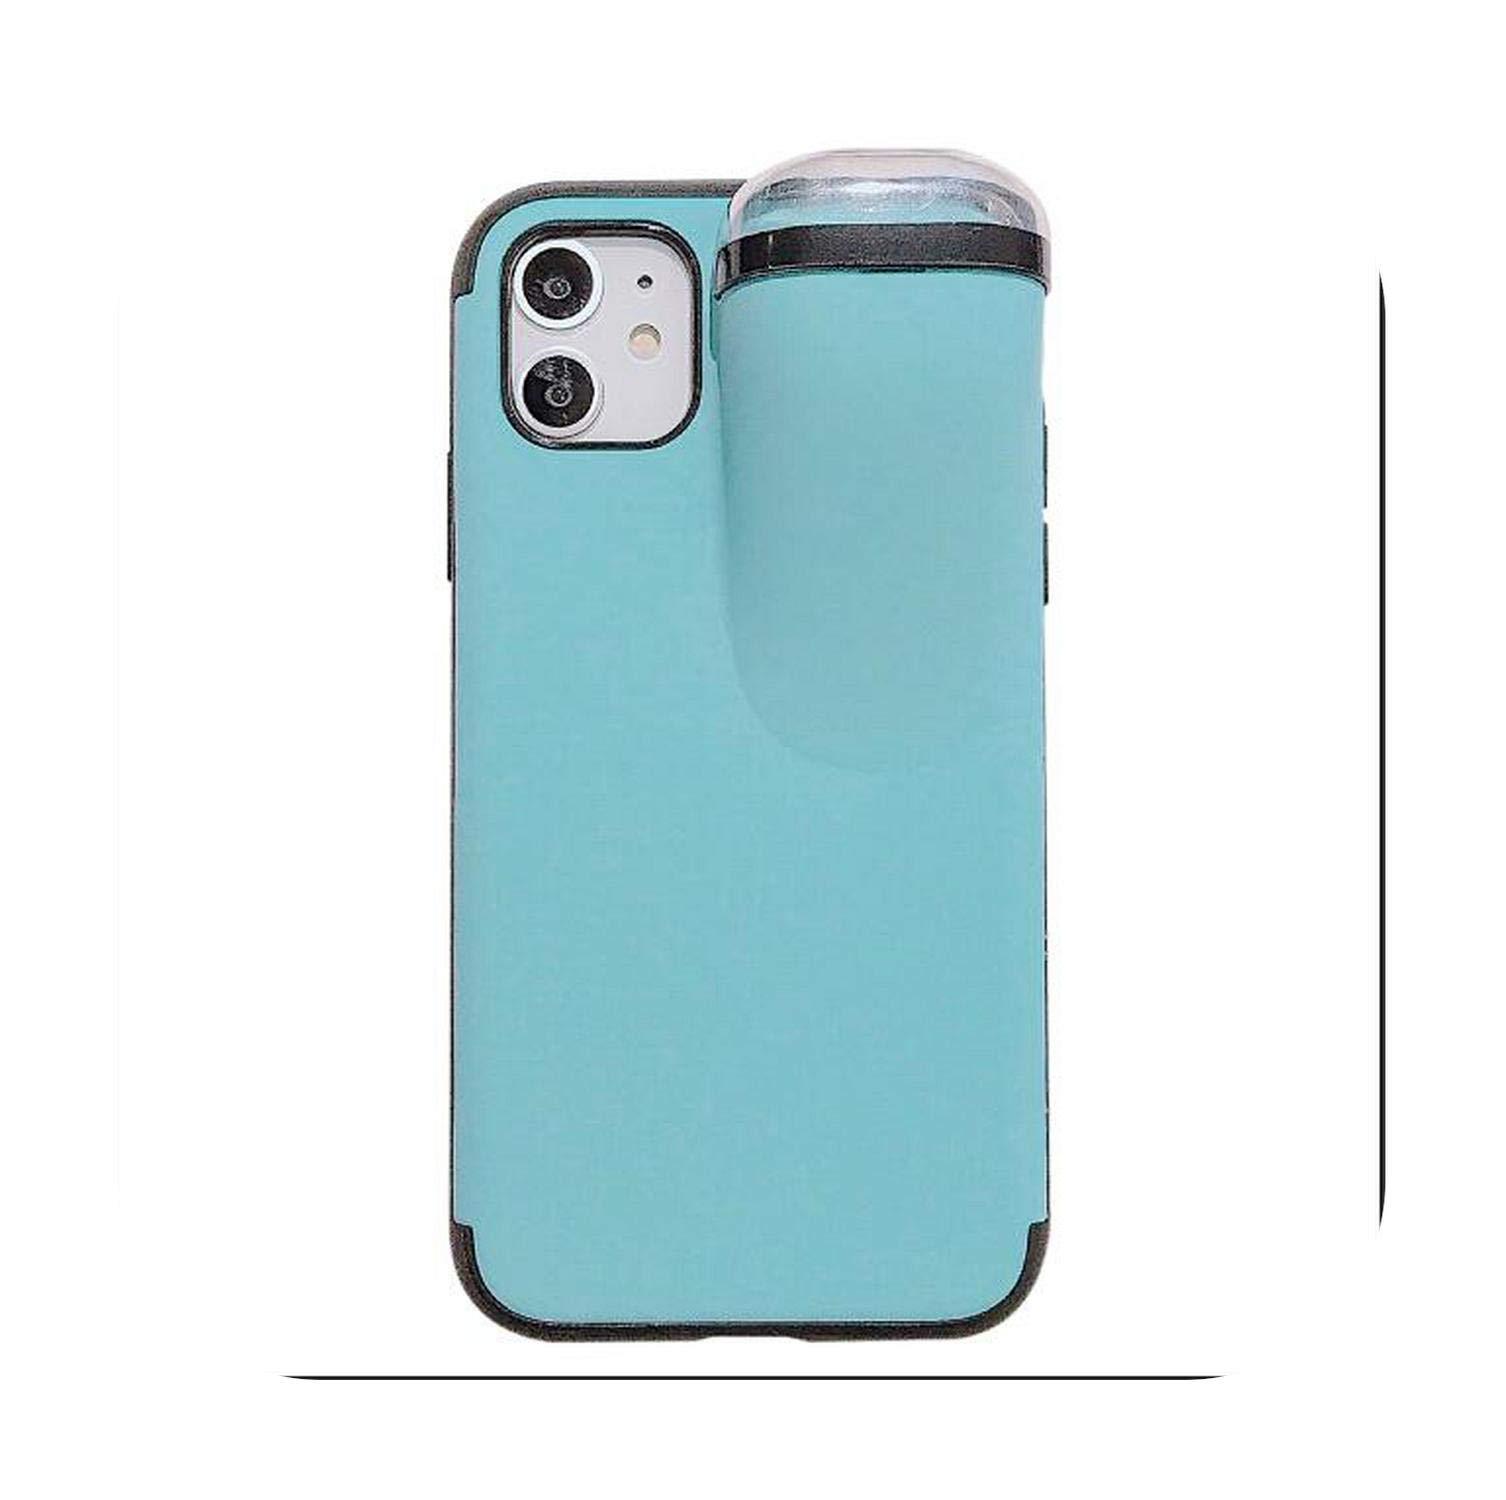 Carcasa para iPhone 2020, 2 en 1, con Airpods, Caja de Almacenamiento para Auriculares para iPhone 11 Pro XS MAX XR X 7 8 Plus, Airpods 1 2 Funda de Silicona Suave: Amazon.es: Electrónica